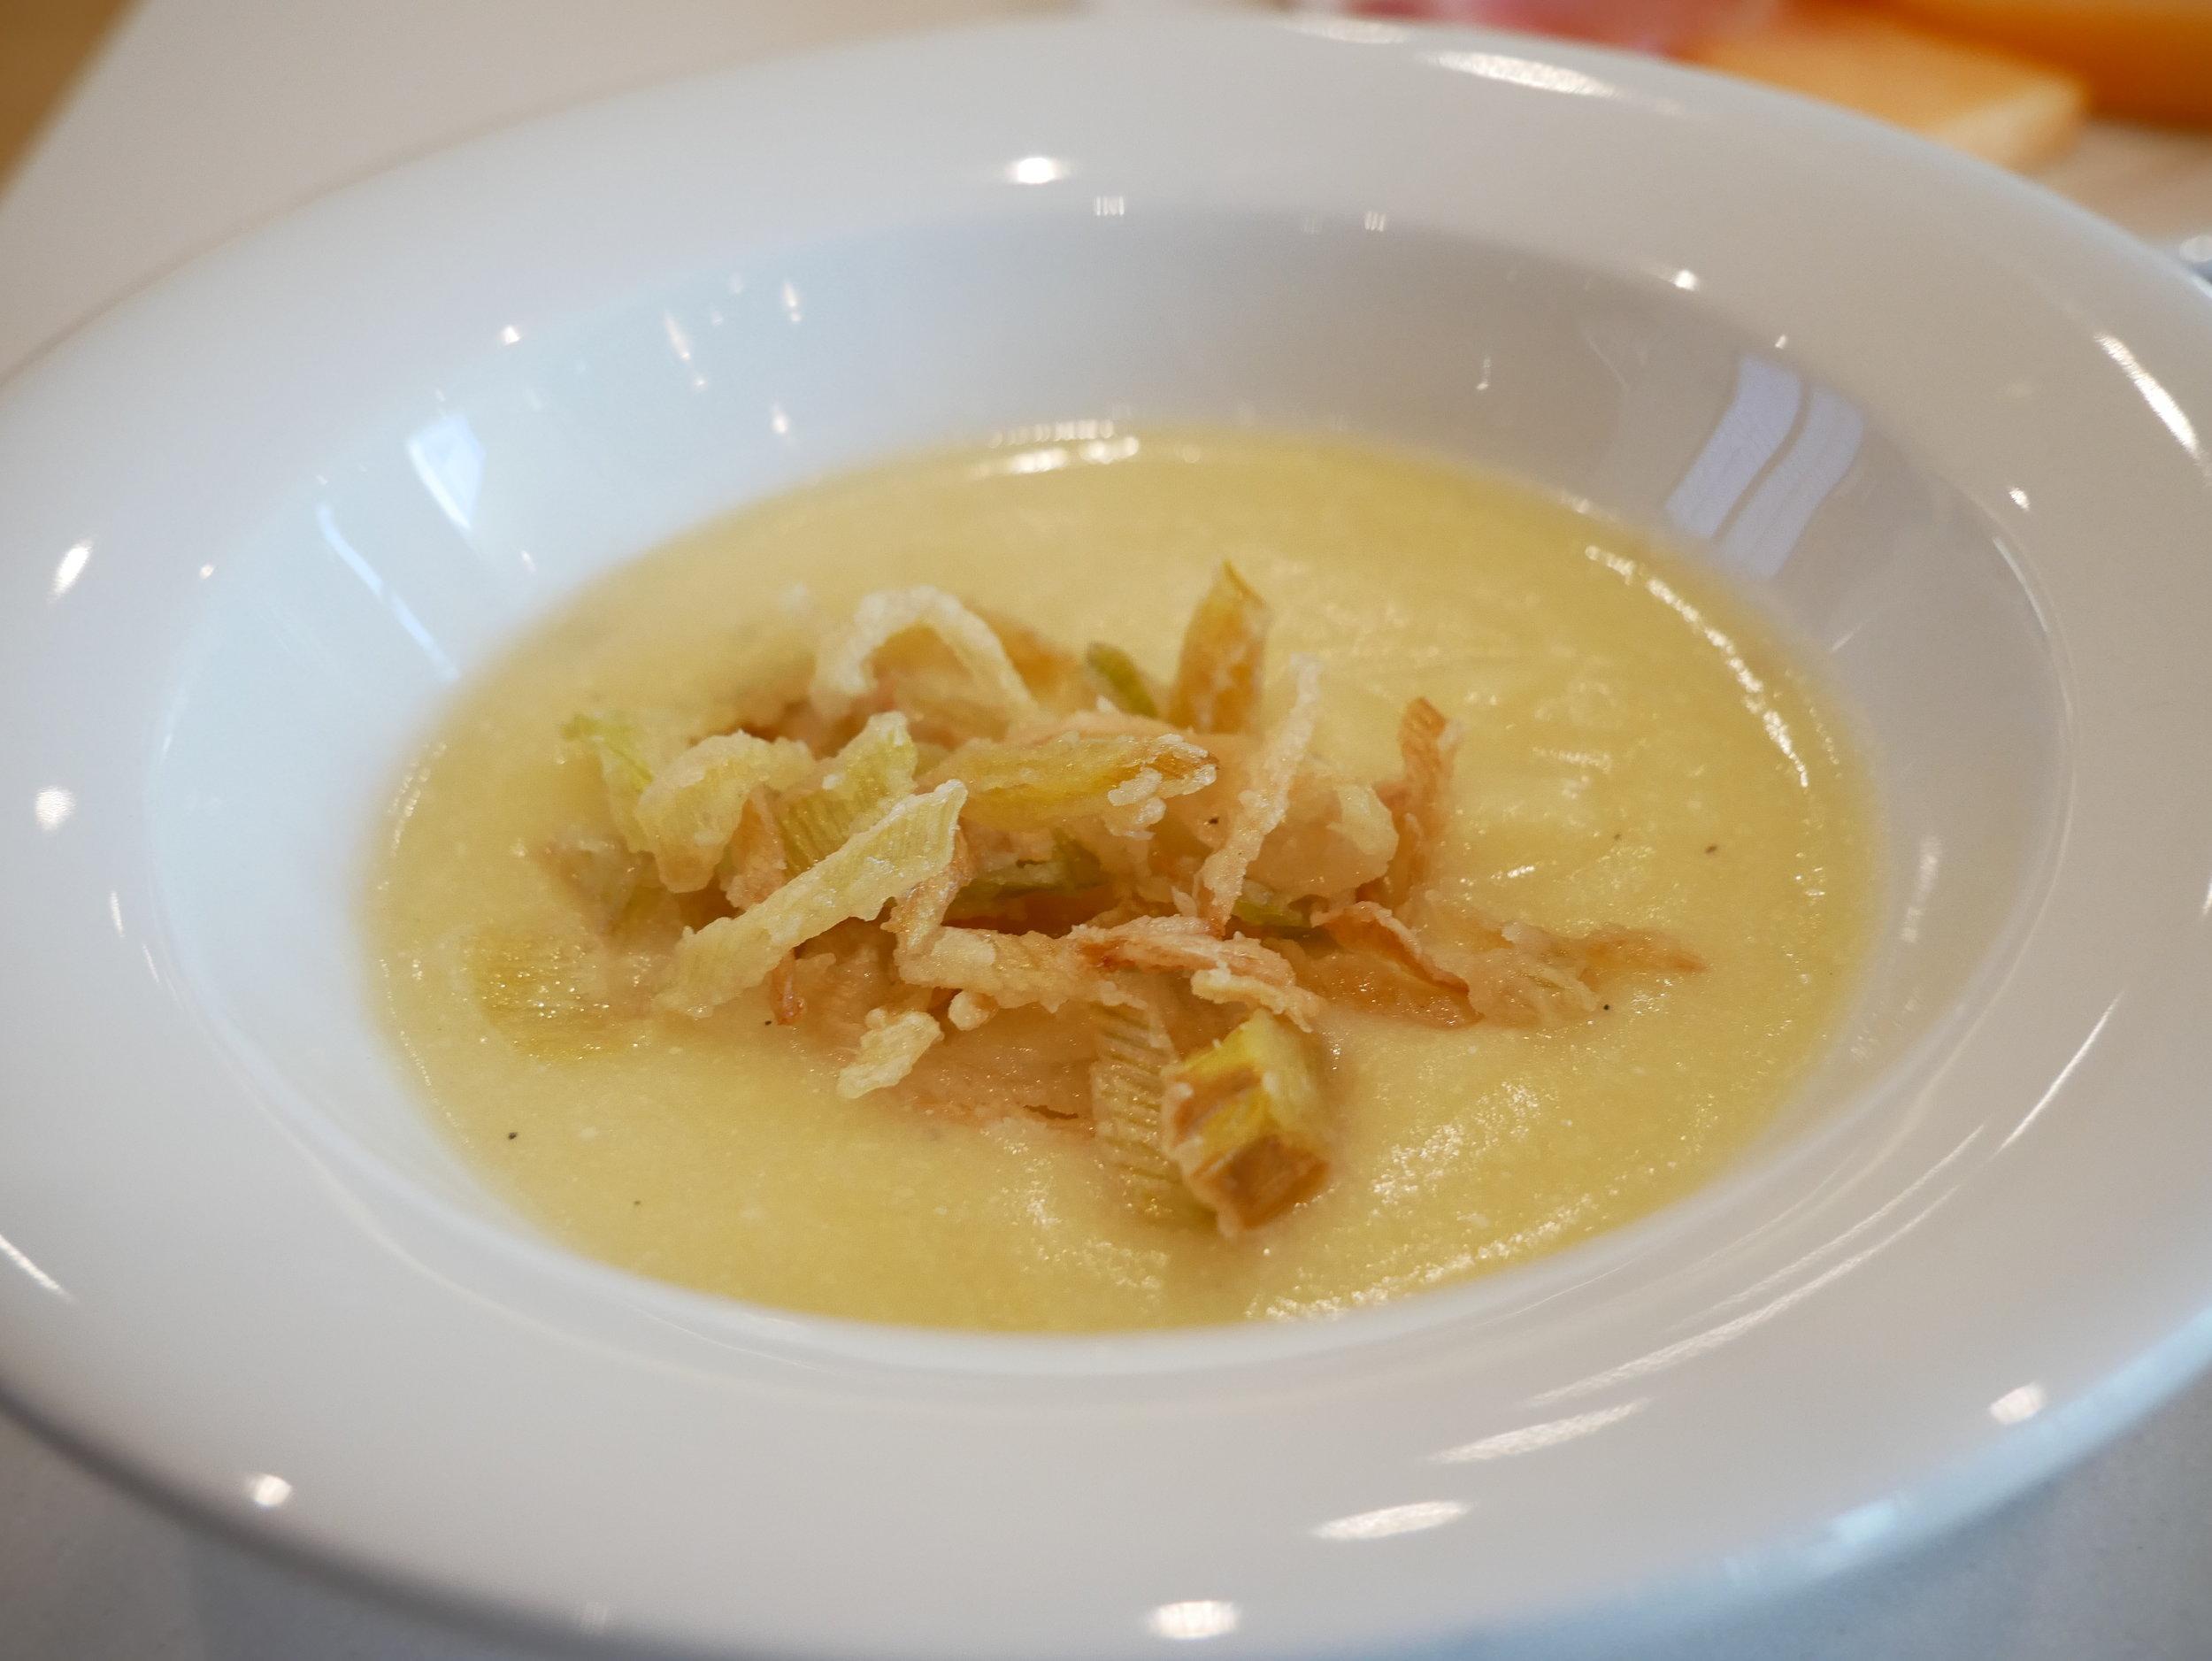 Milan Lufthansa Lounge soup